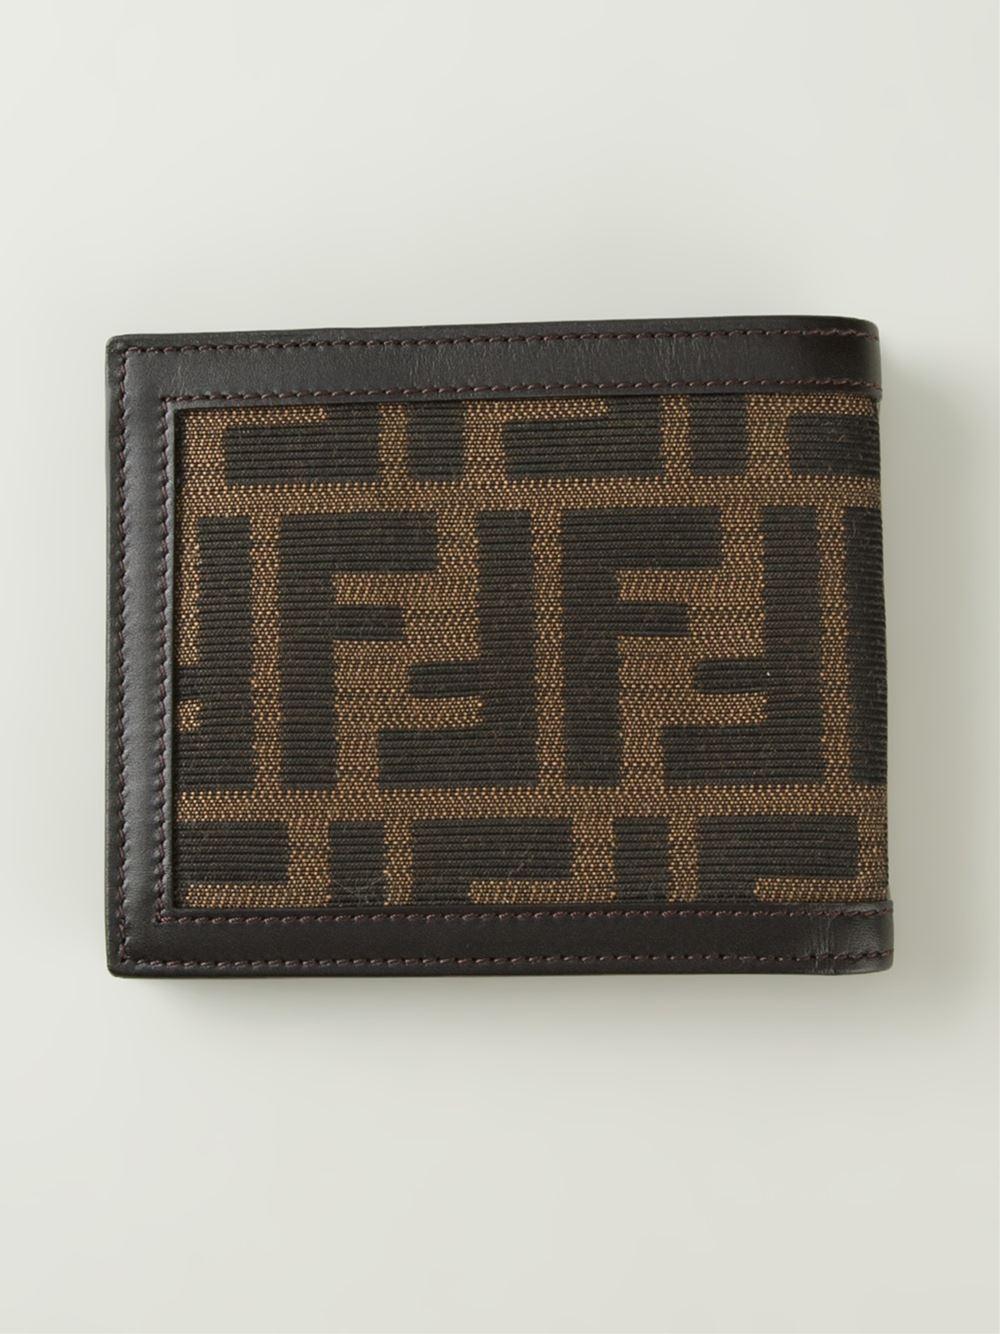 fendi ff logo billfold wallet in brown for men